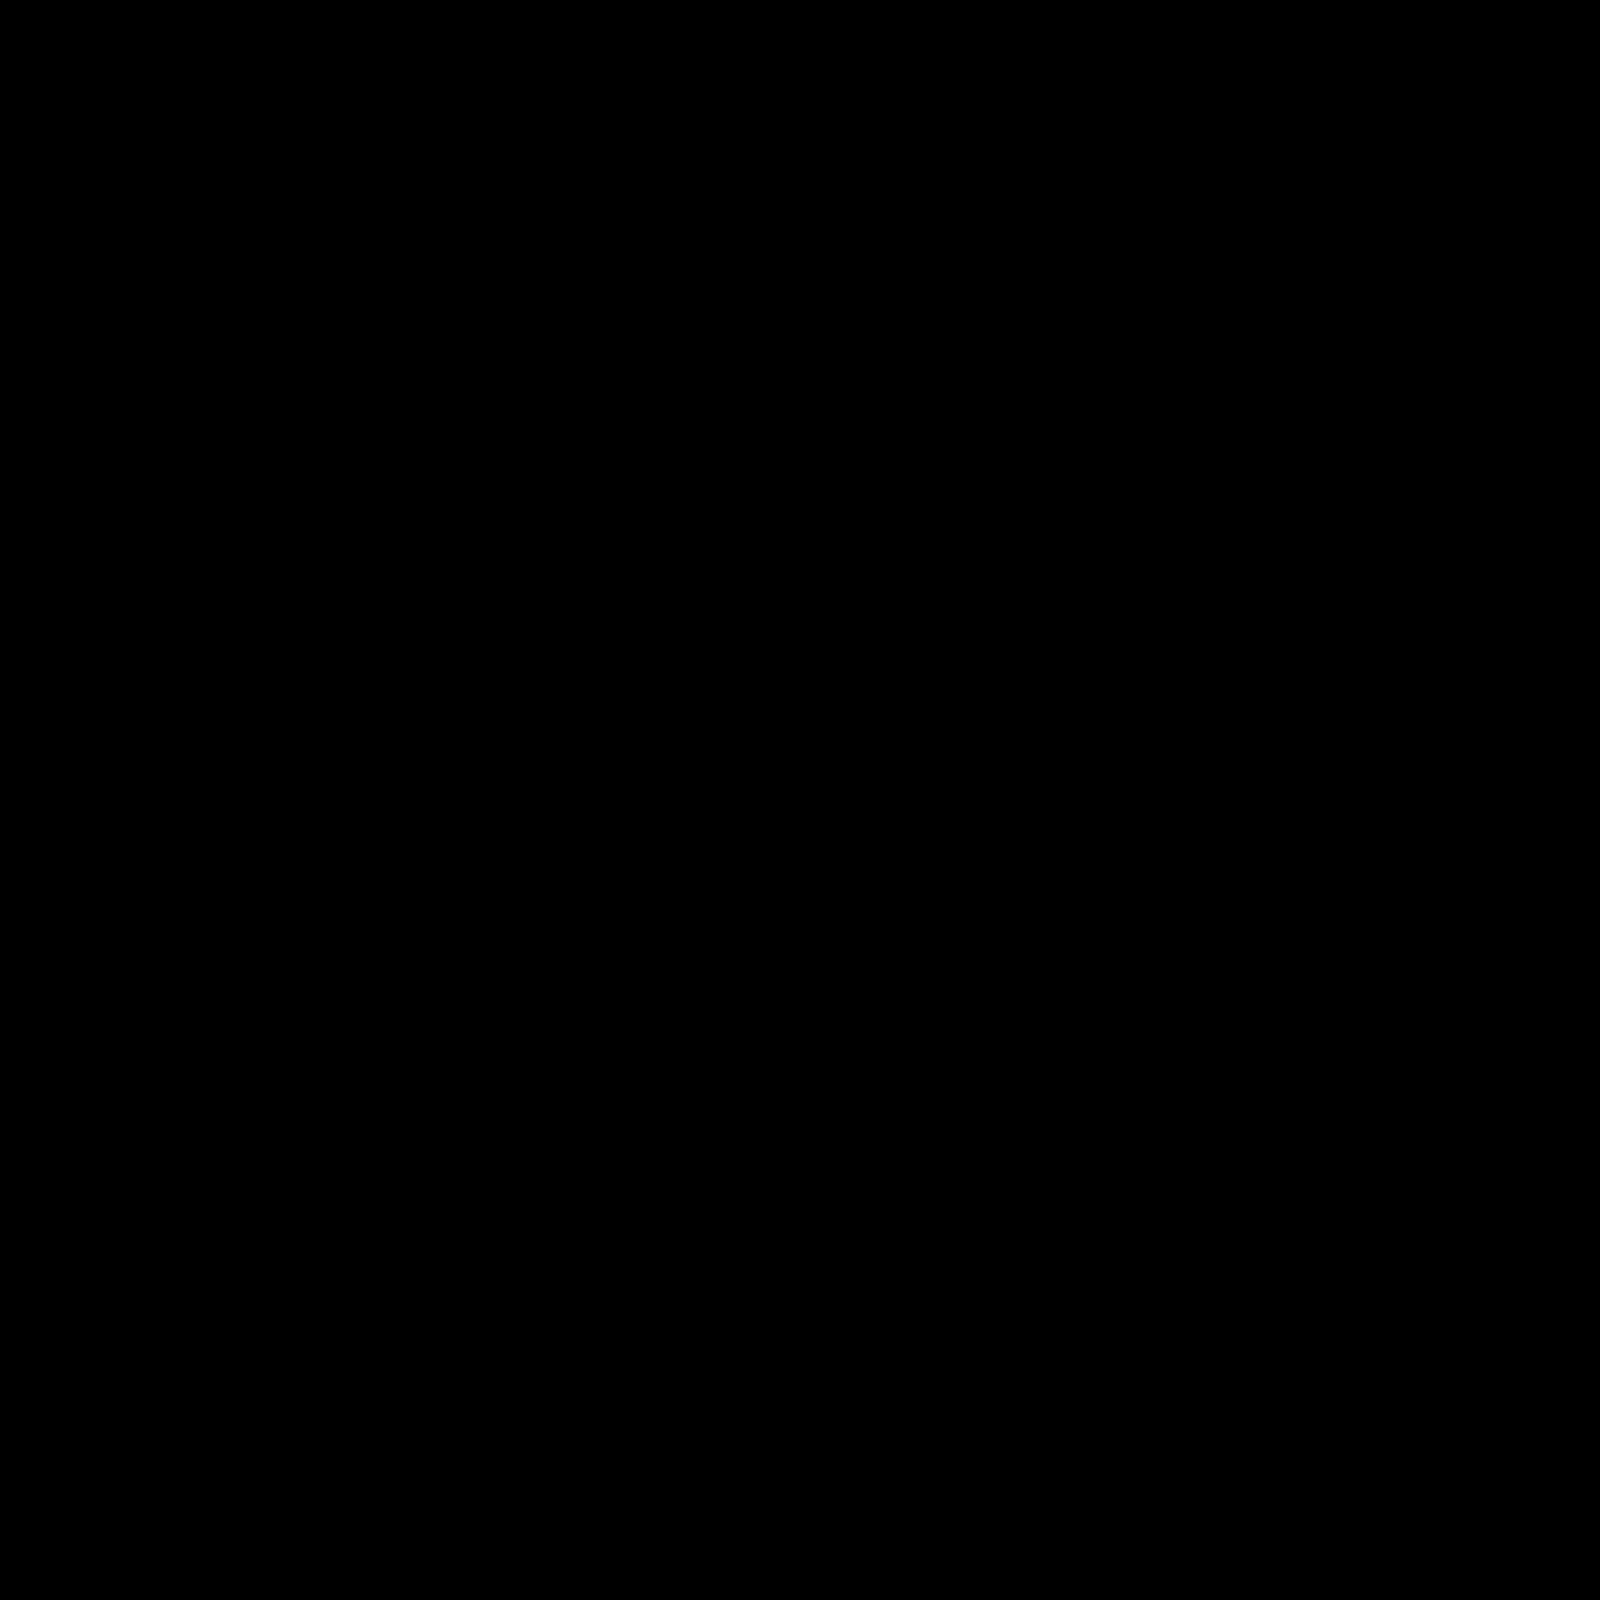 Заказ отправлен icon